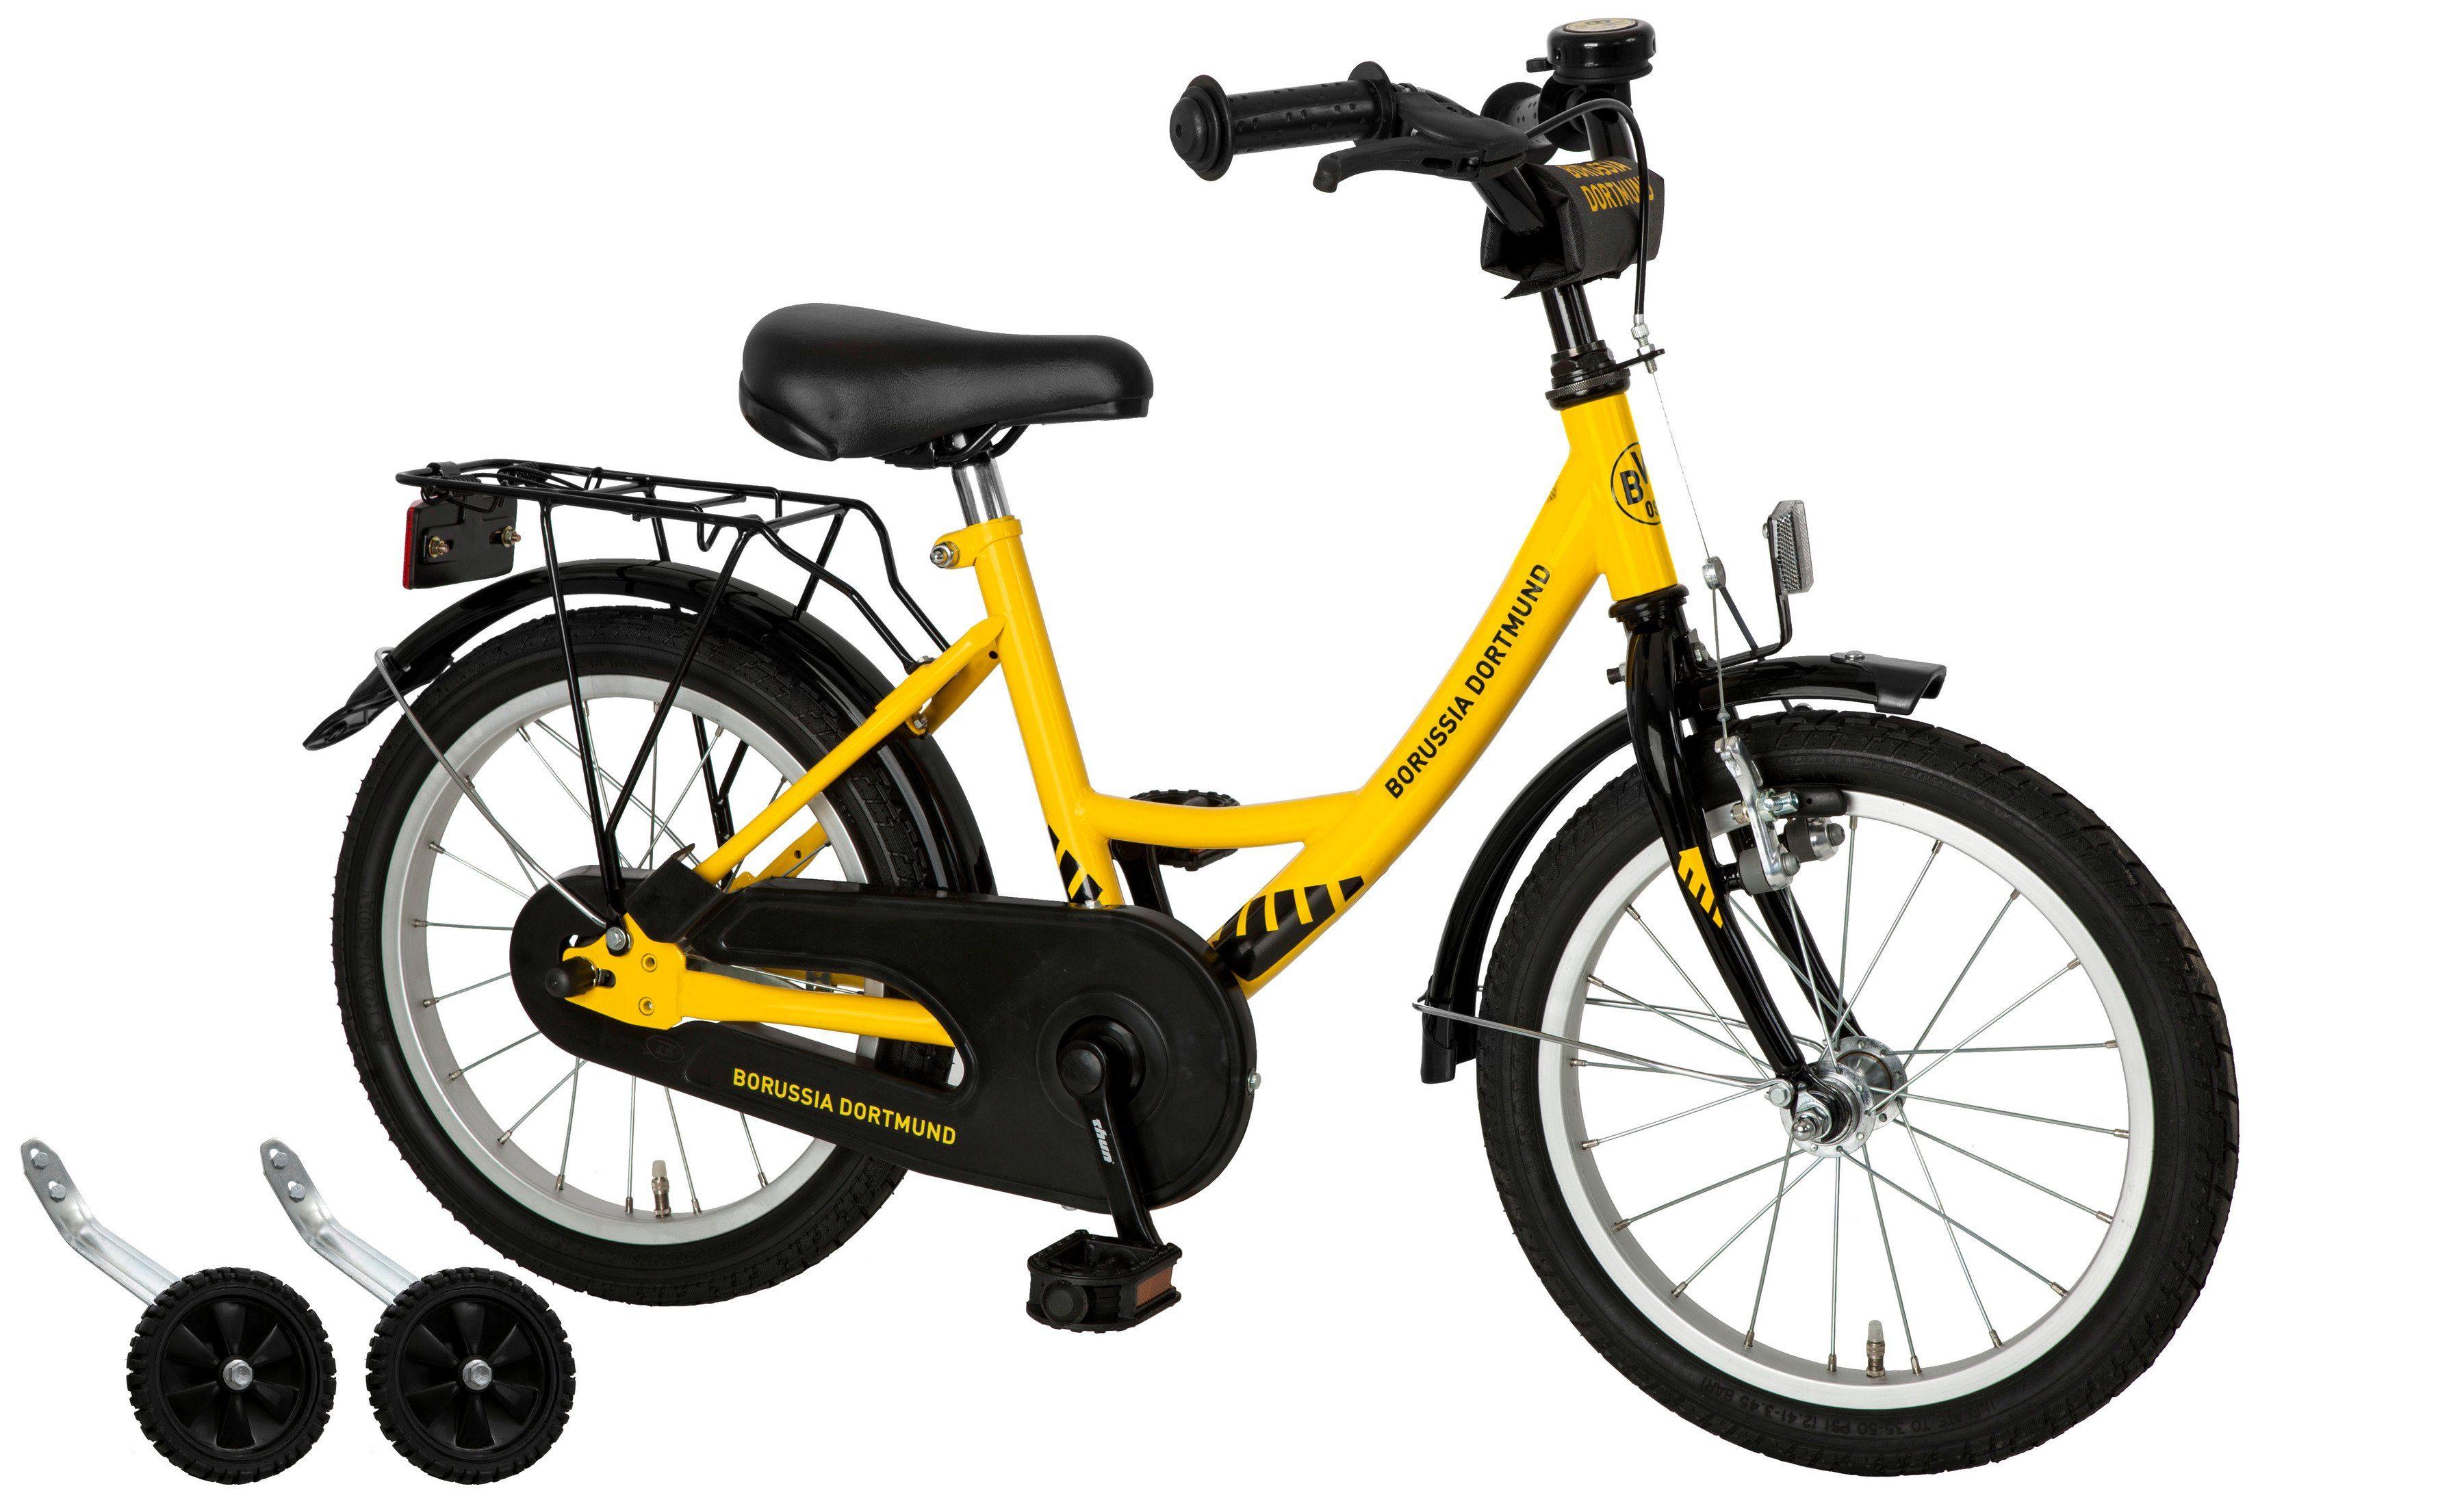 Cycles4Kids Kinderfahrrad »Borussia Dortmund, 40,64 cm (16 Zoll)«